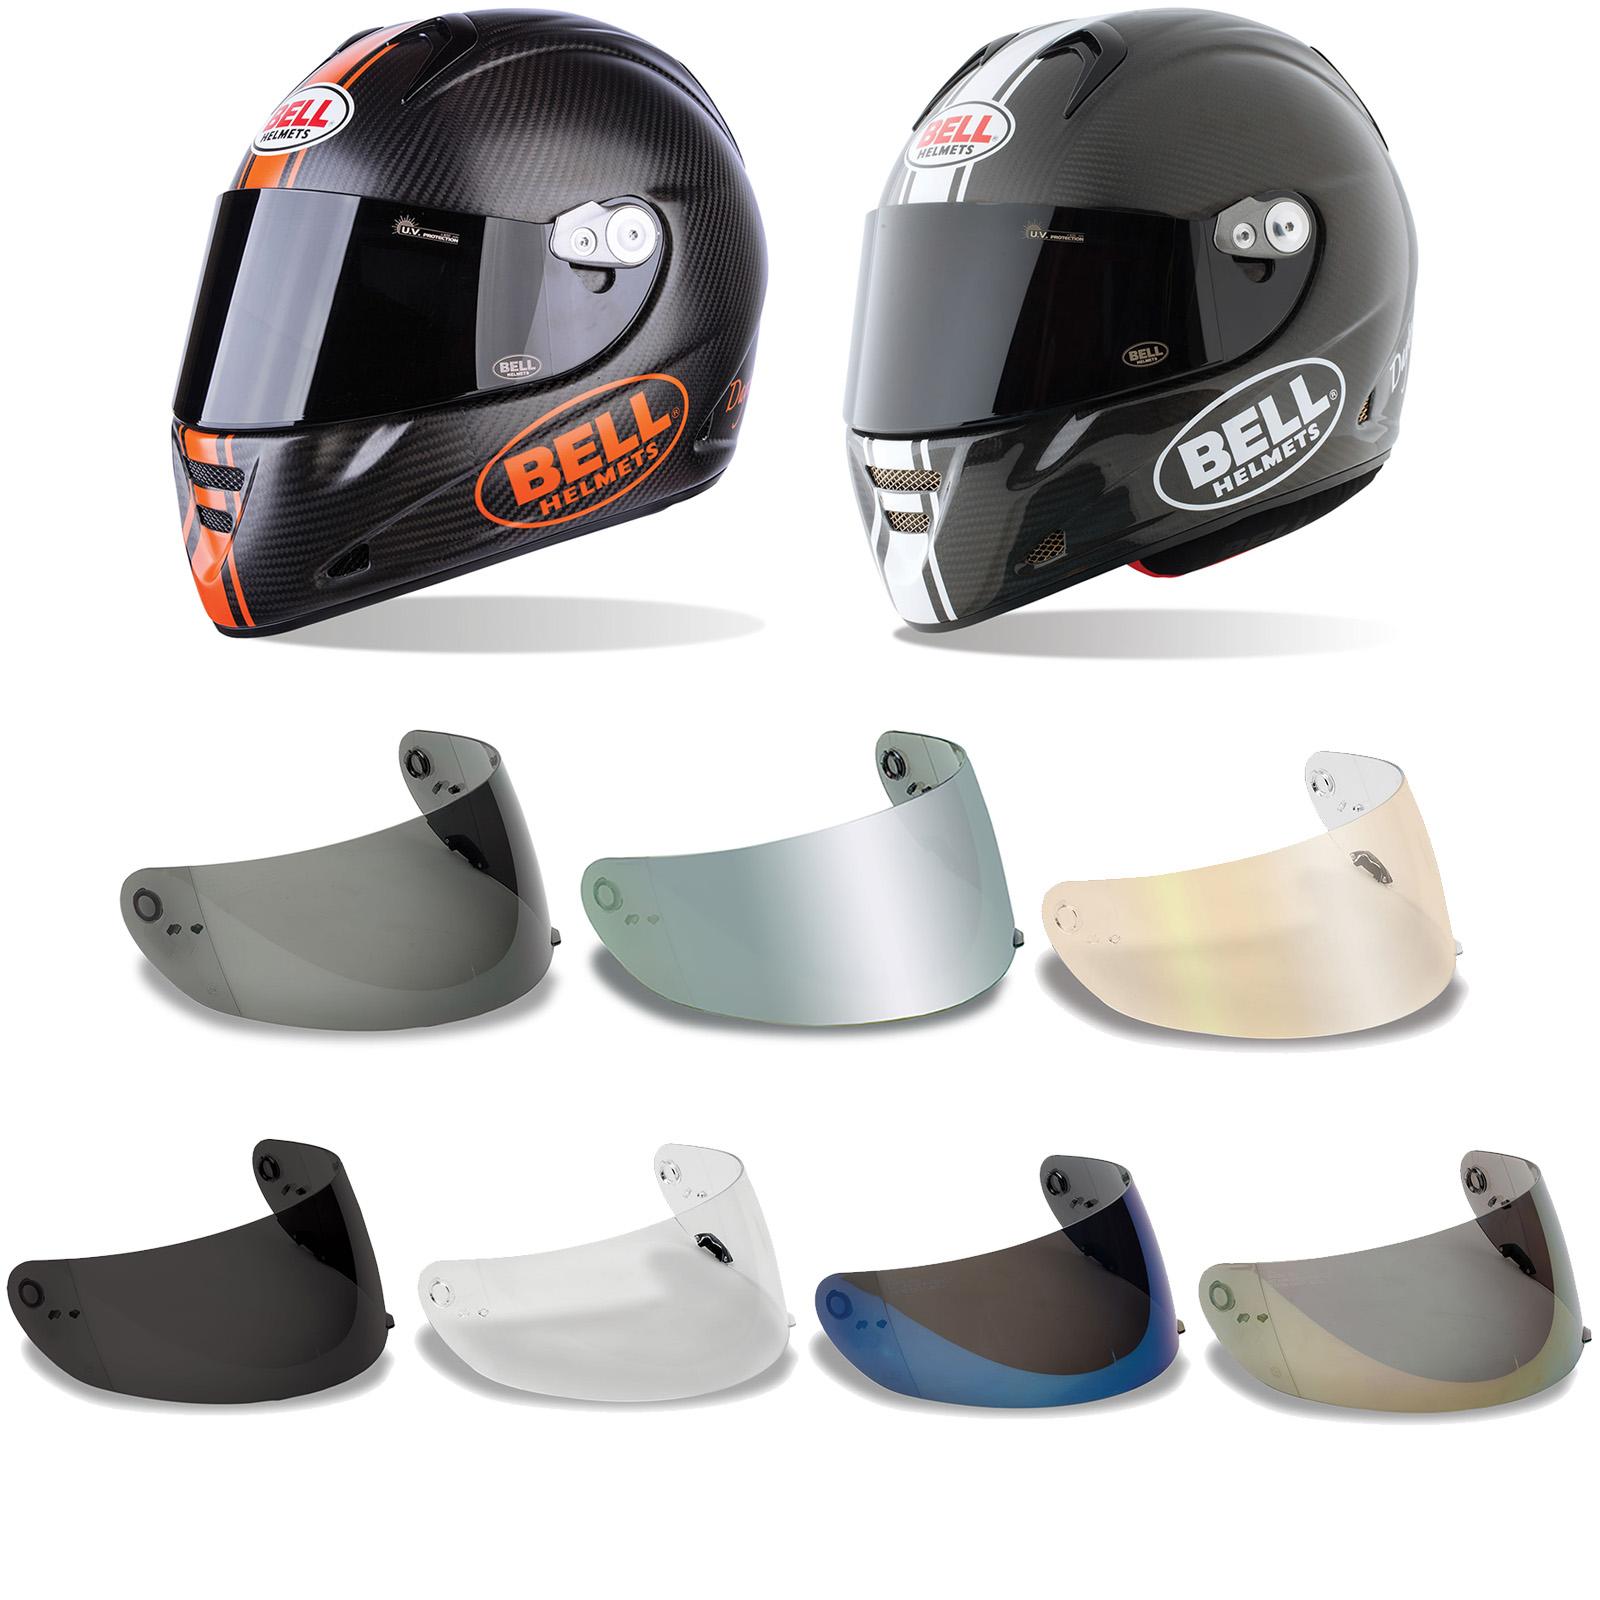 bell m5x daytona carbon motorcycle helmet and visor full. Black Bedroom Furniture Sets. Home Design Ideas